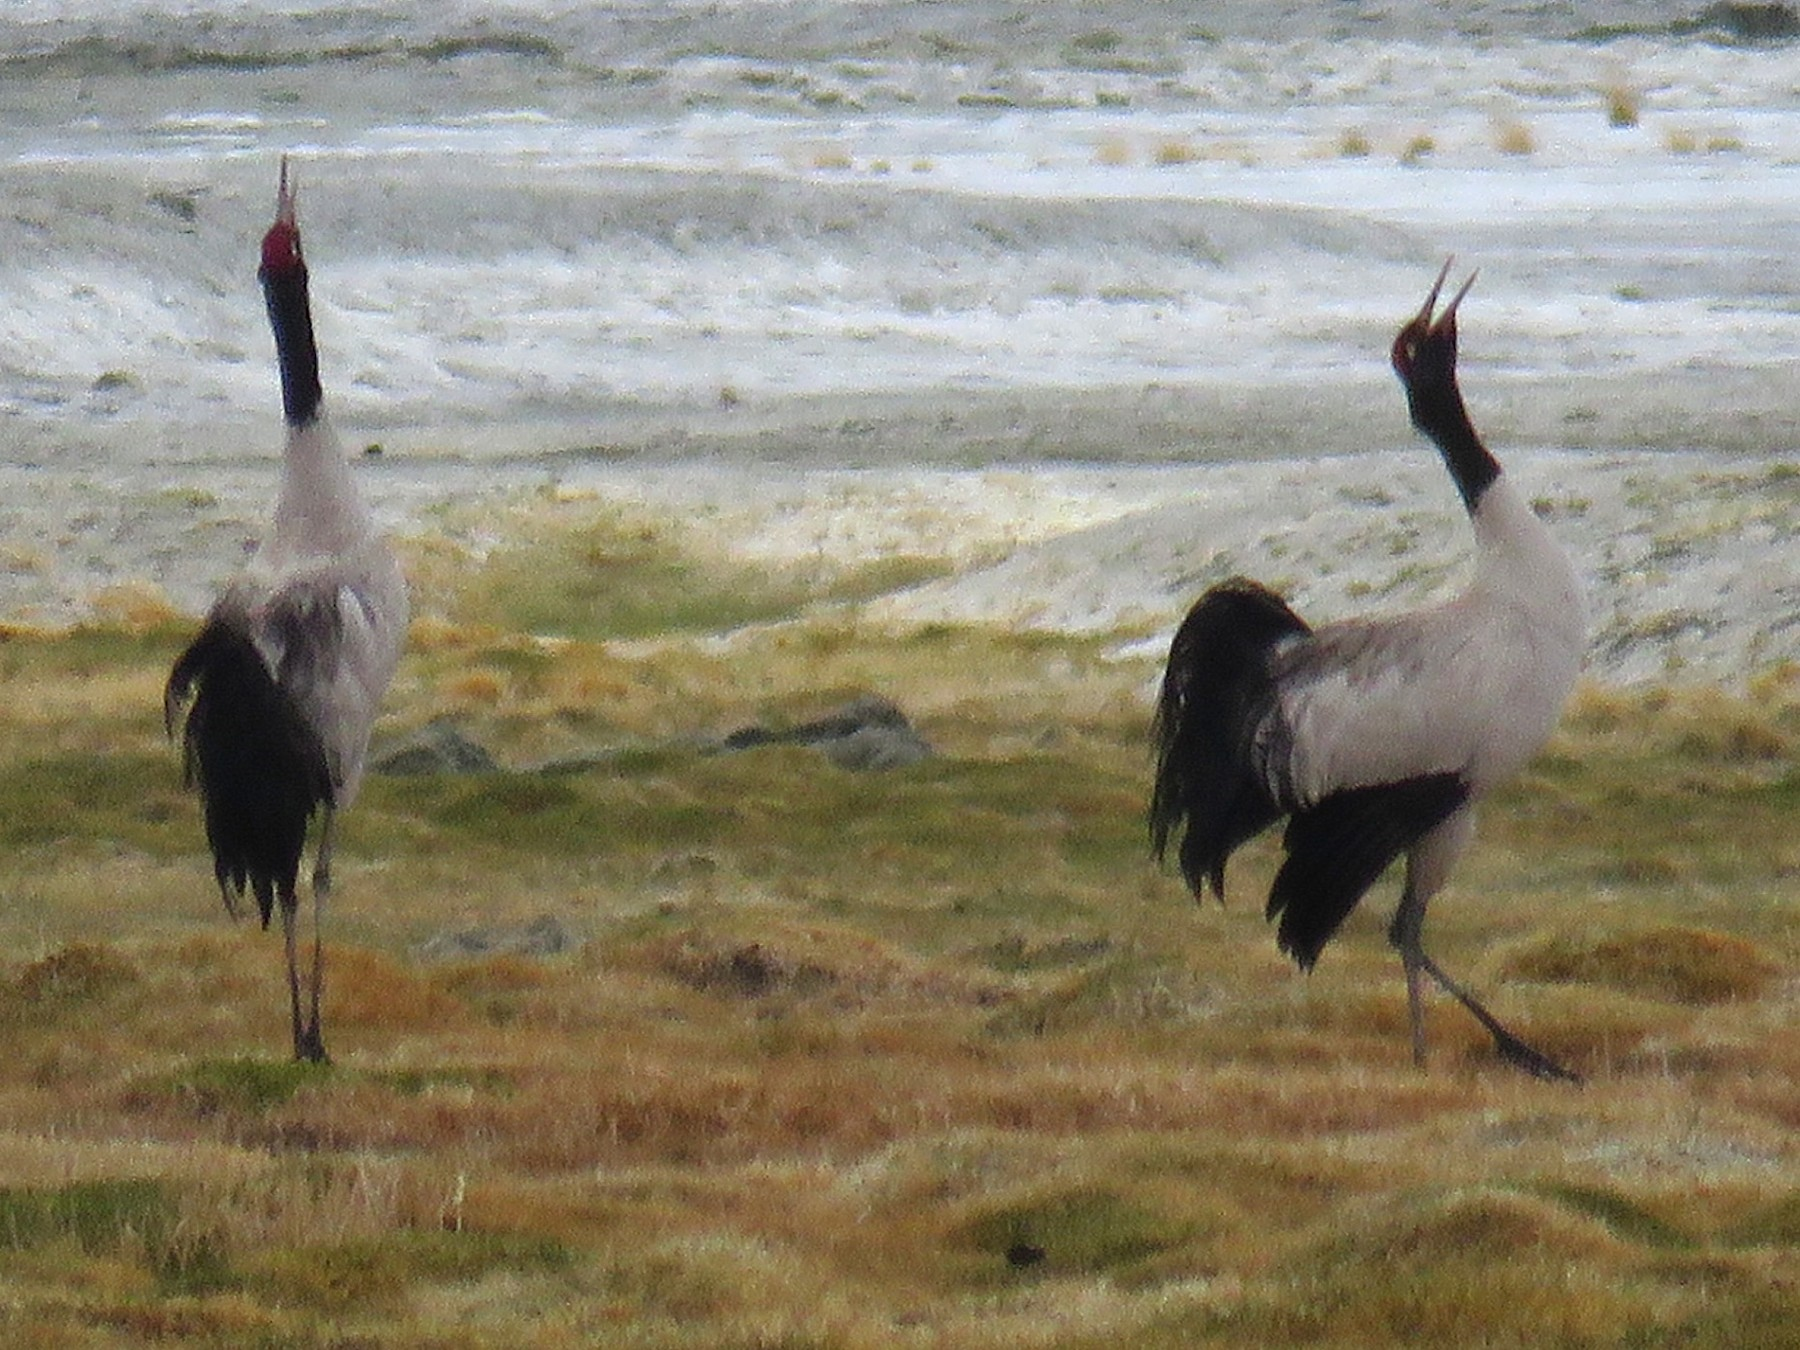 Black-necked Crane - Ritvik Singh